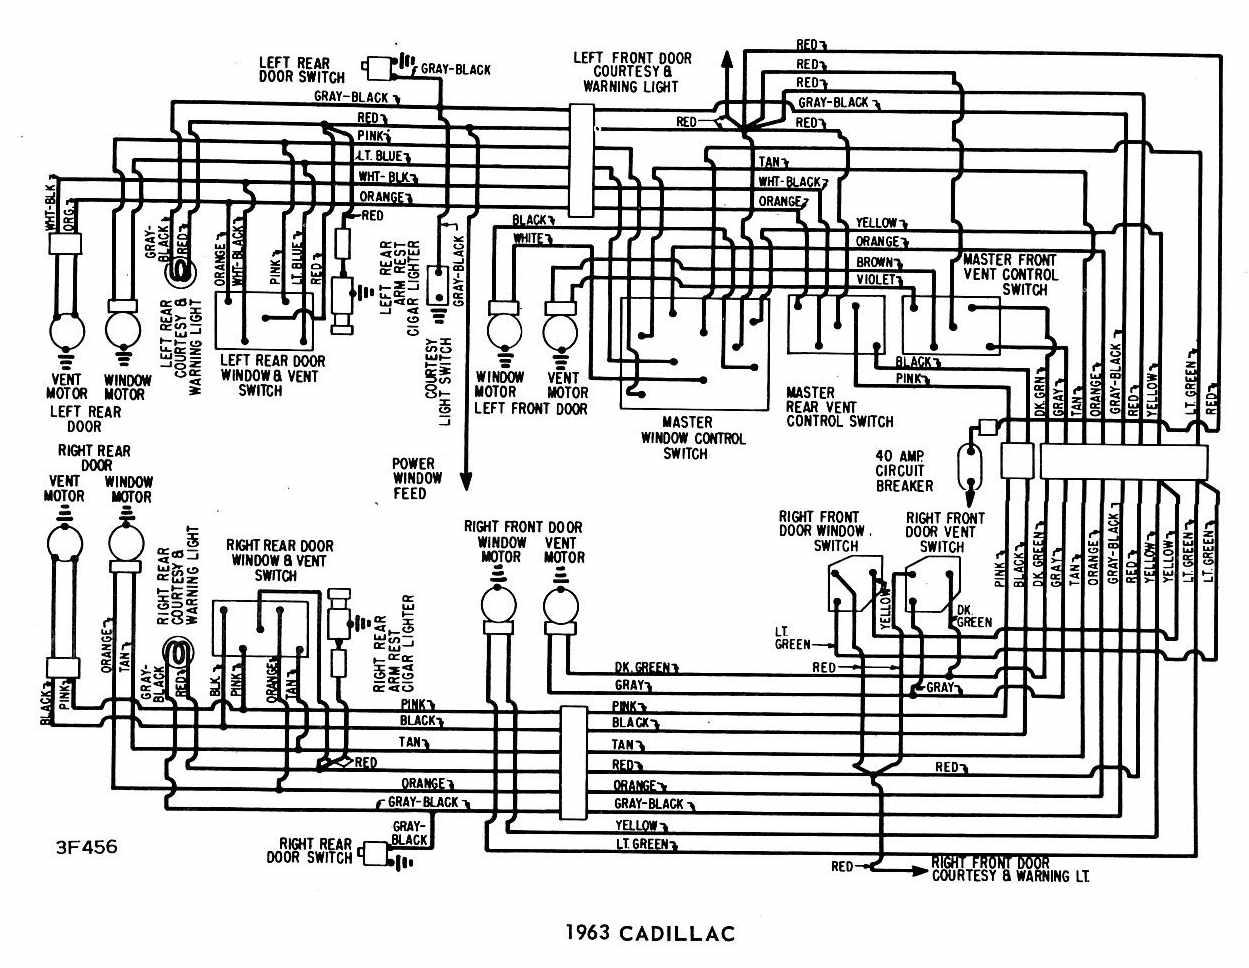 Boss Plow Wiring Diagram Chevy 1996 - Wiring Data